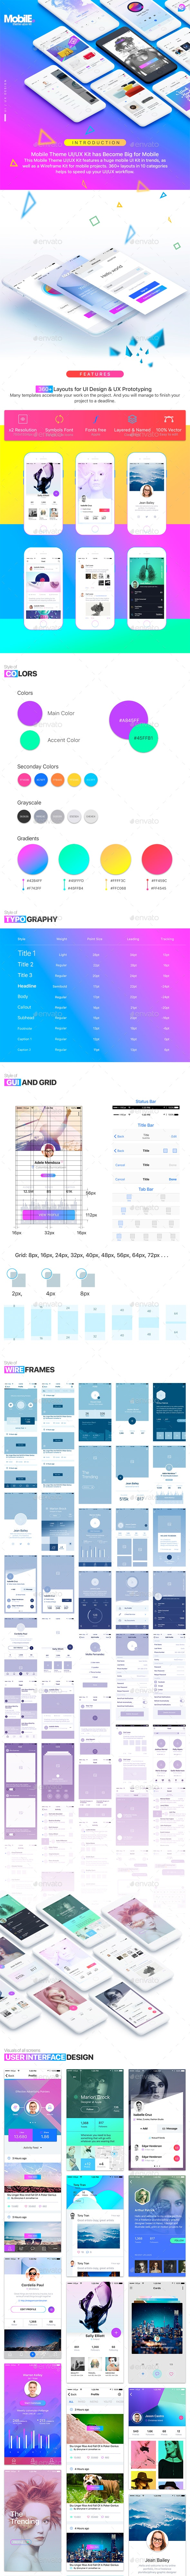 Mobile Theme UI/UX Kit - User Interfaces Web Elements